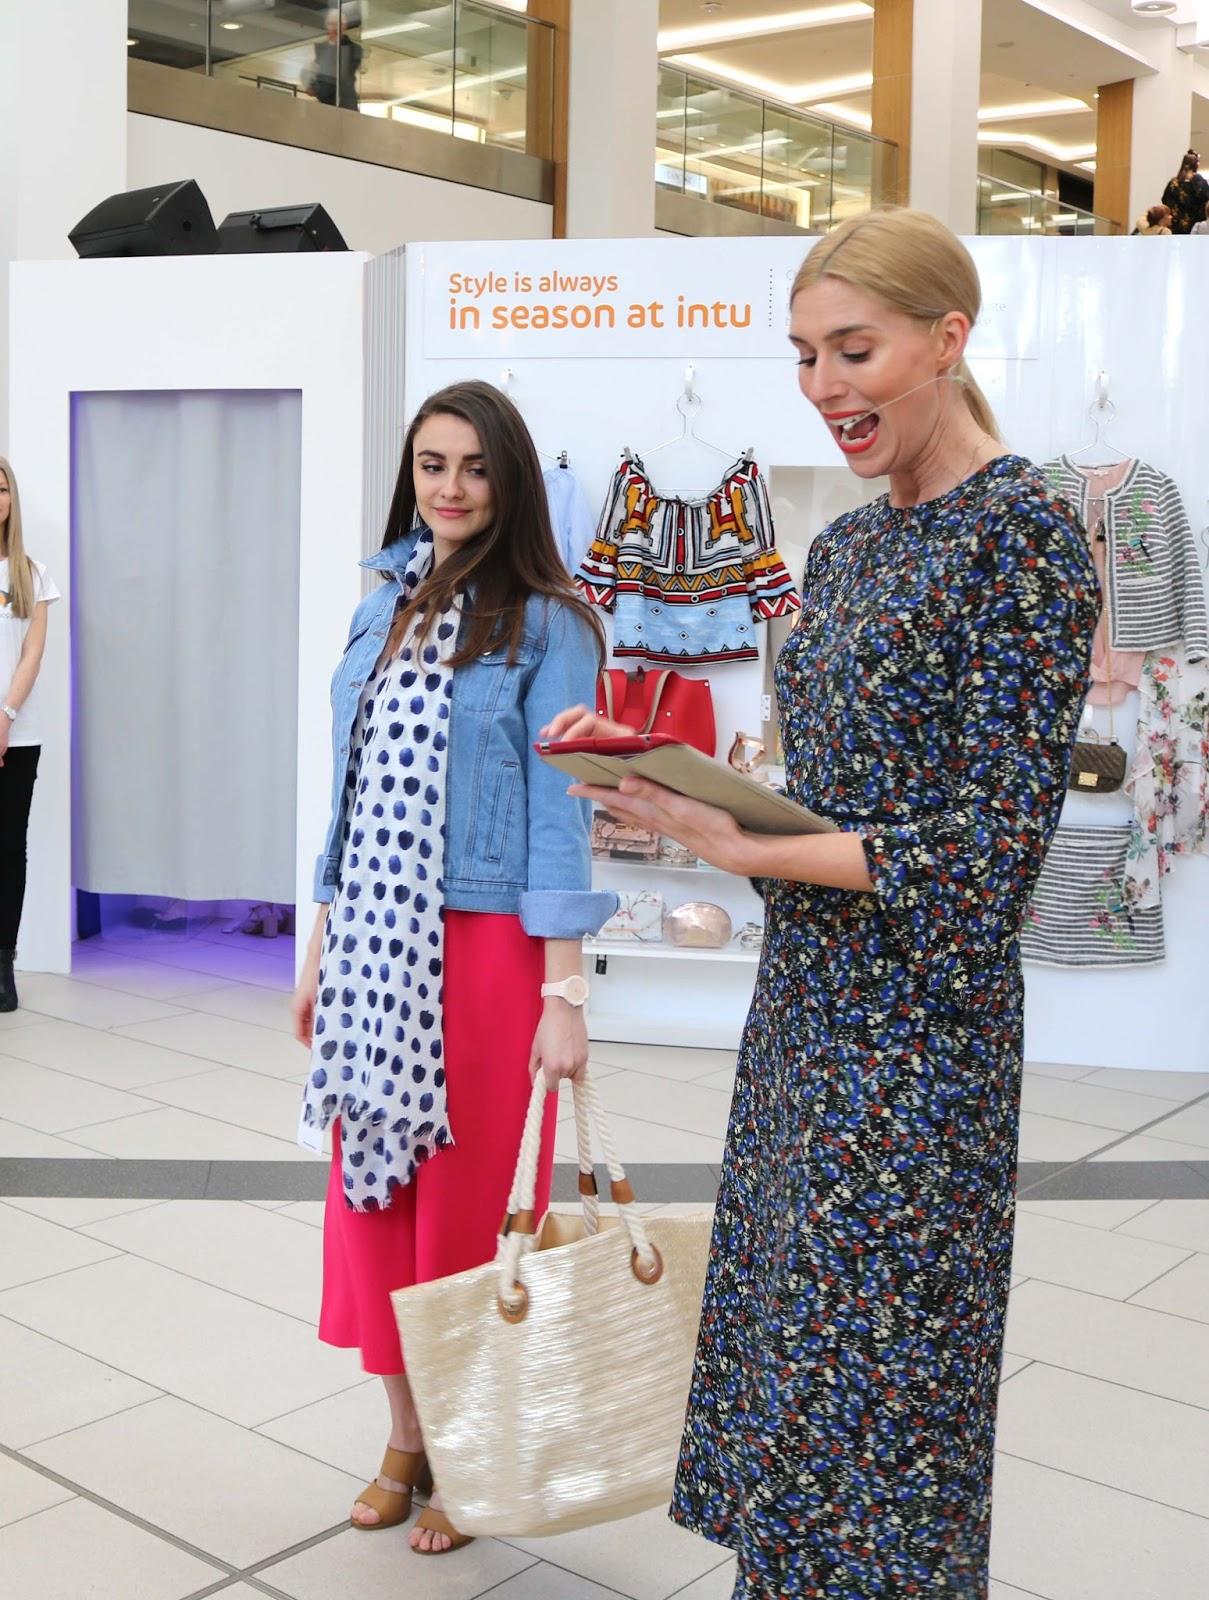 Intu Victoria Centre, Nottingham, fashion week, fashion, event, lifestyle,SS17, stripes, floral, style,